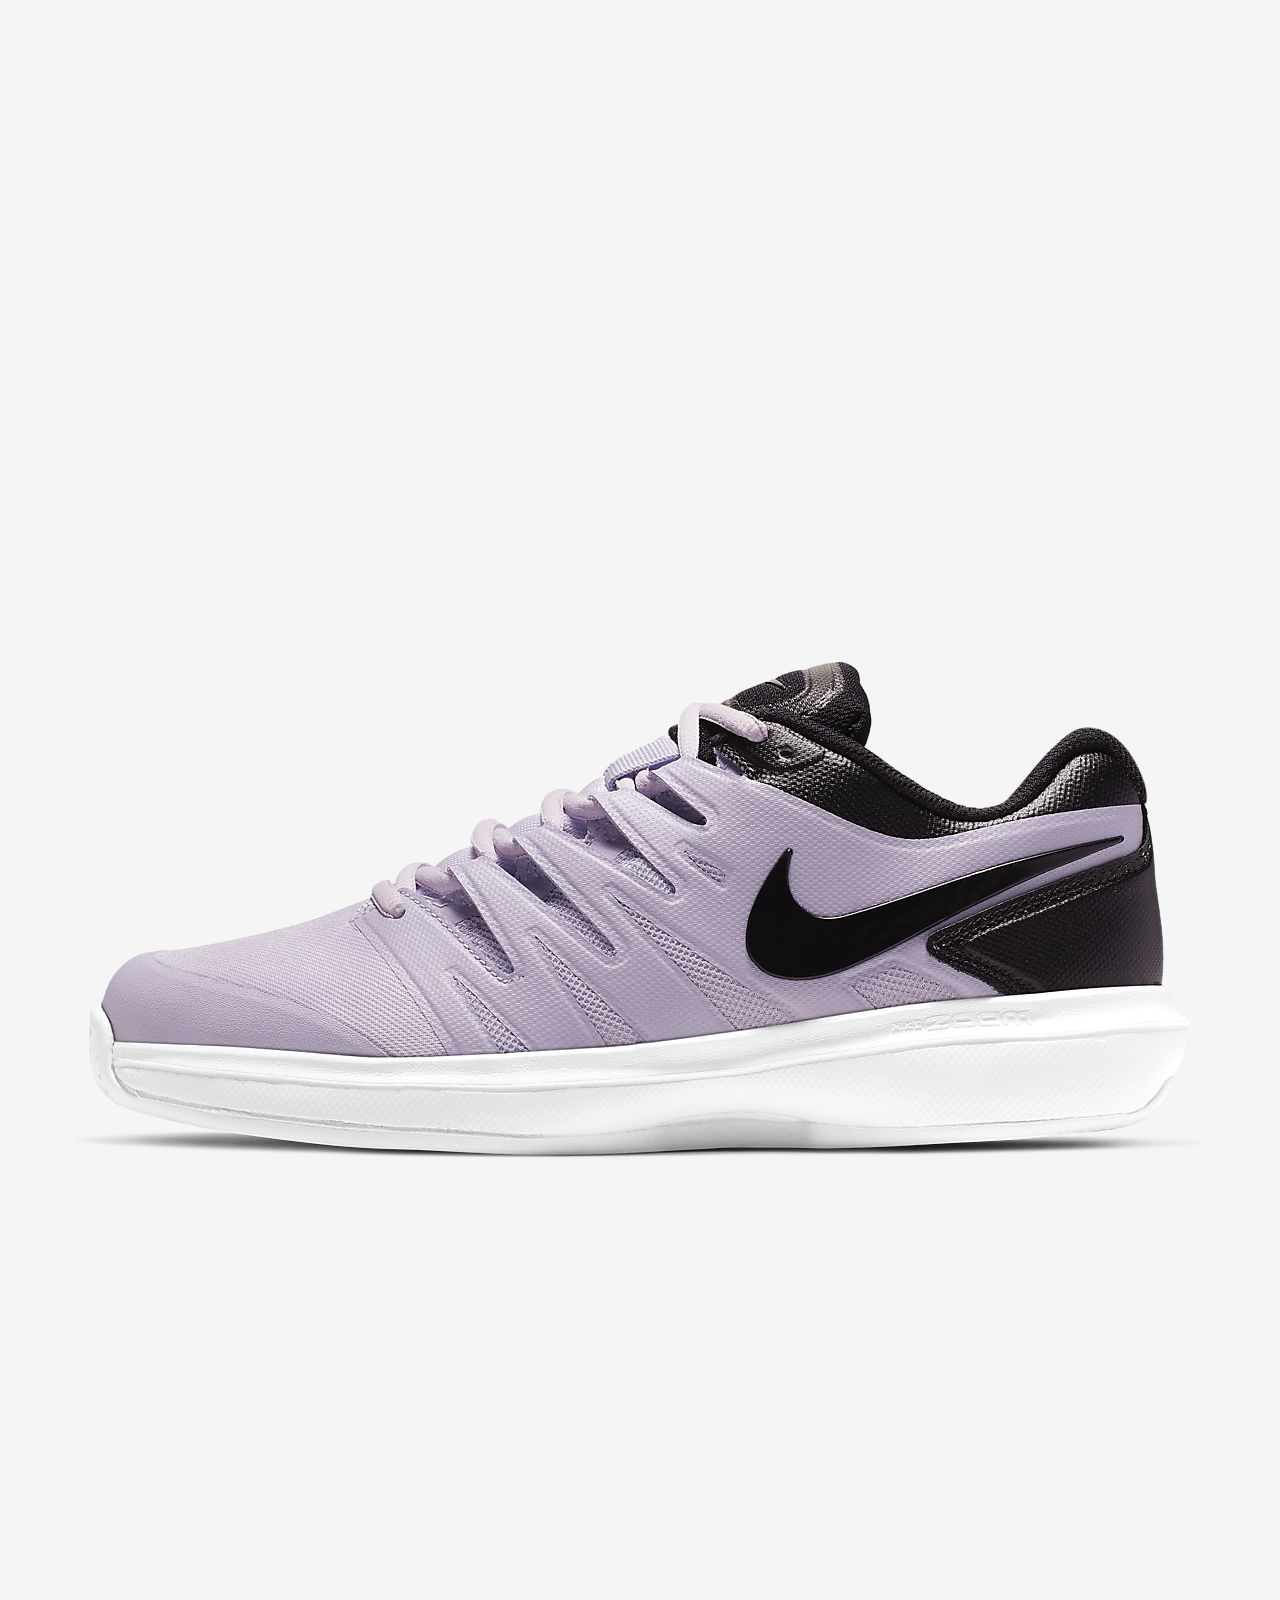 premium selection 9538c abaea NikeCourt Air Zoom Prestige-hardcourt-tennissko til kvinder. Nike.com DK